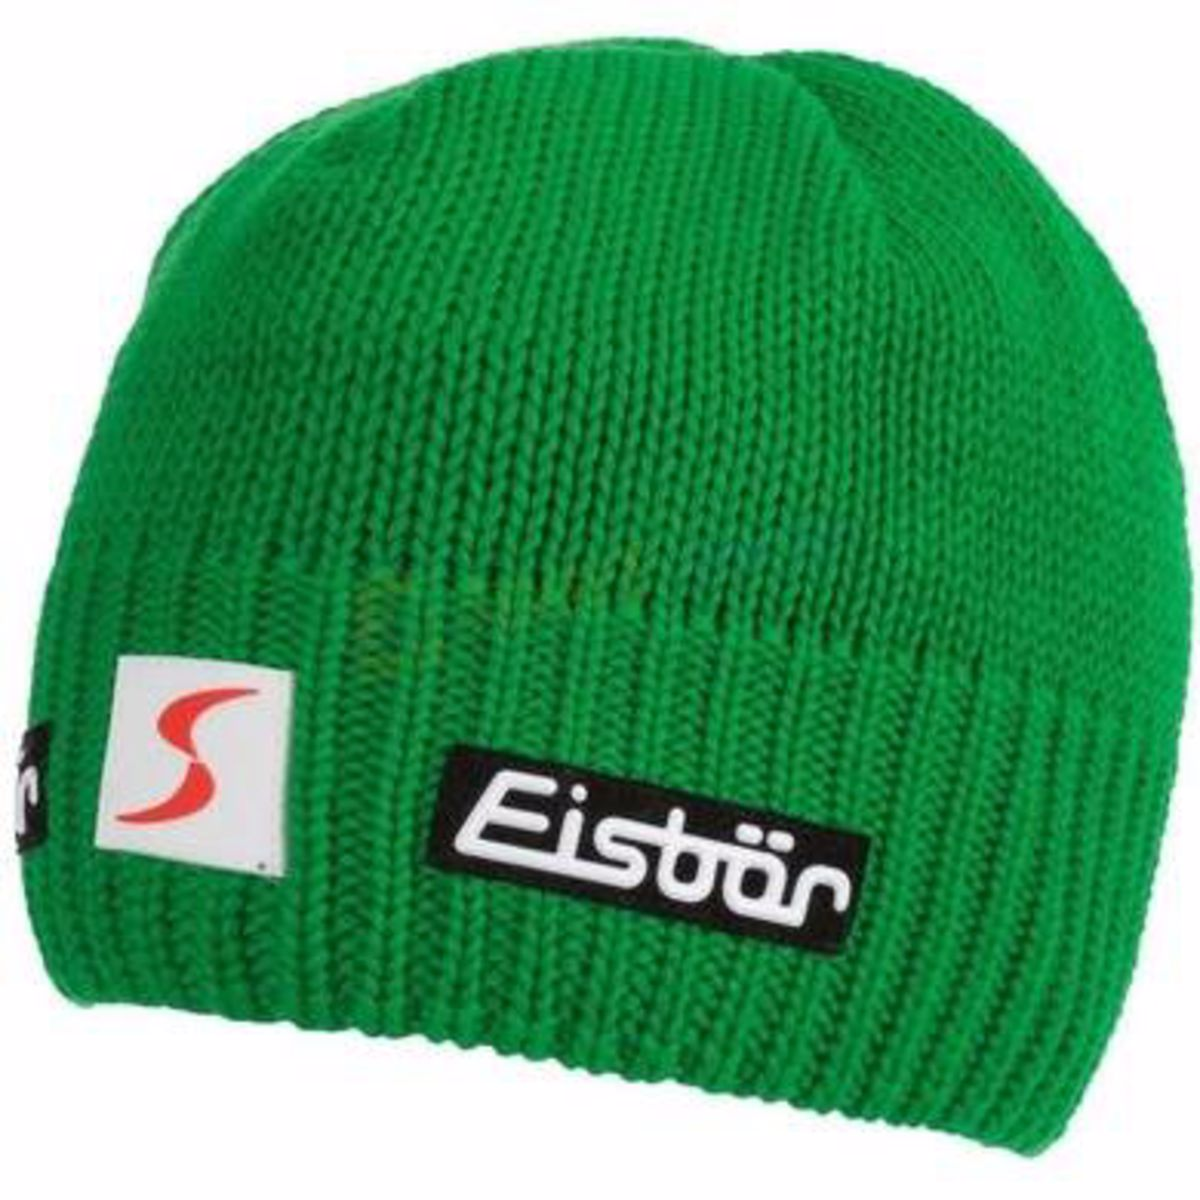 376ca9652 EISBÄR TROP MÜ XL SP zelená - pletená čiapka | VeredaSport.sk